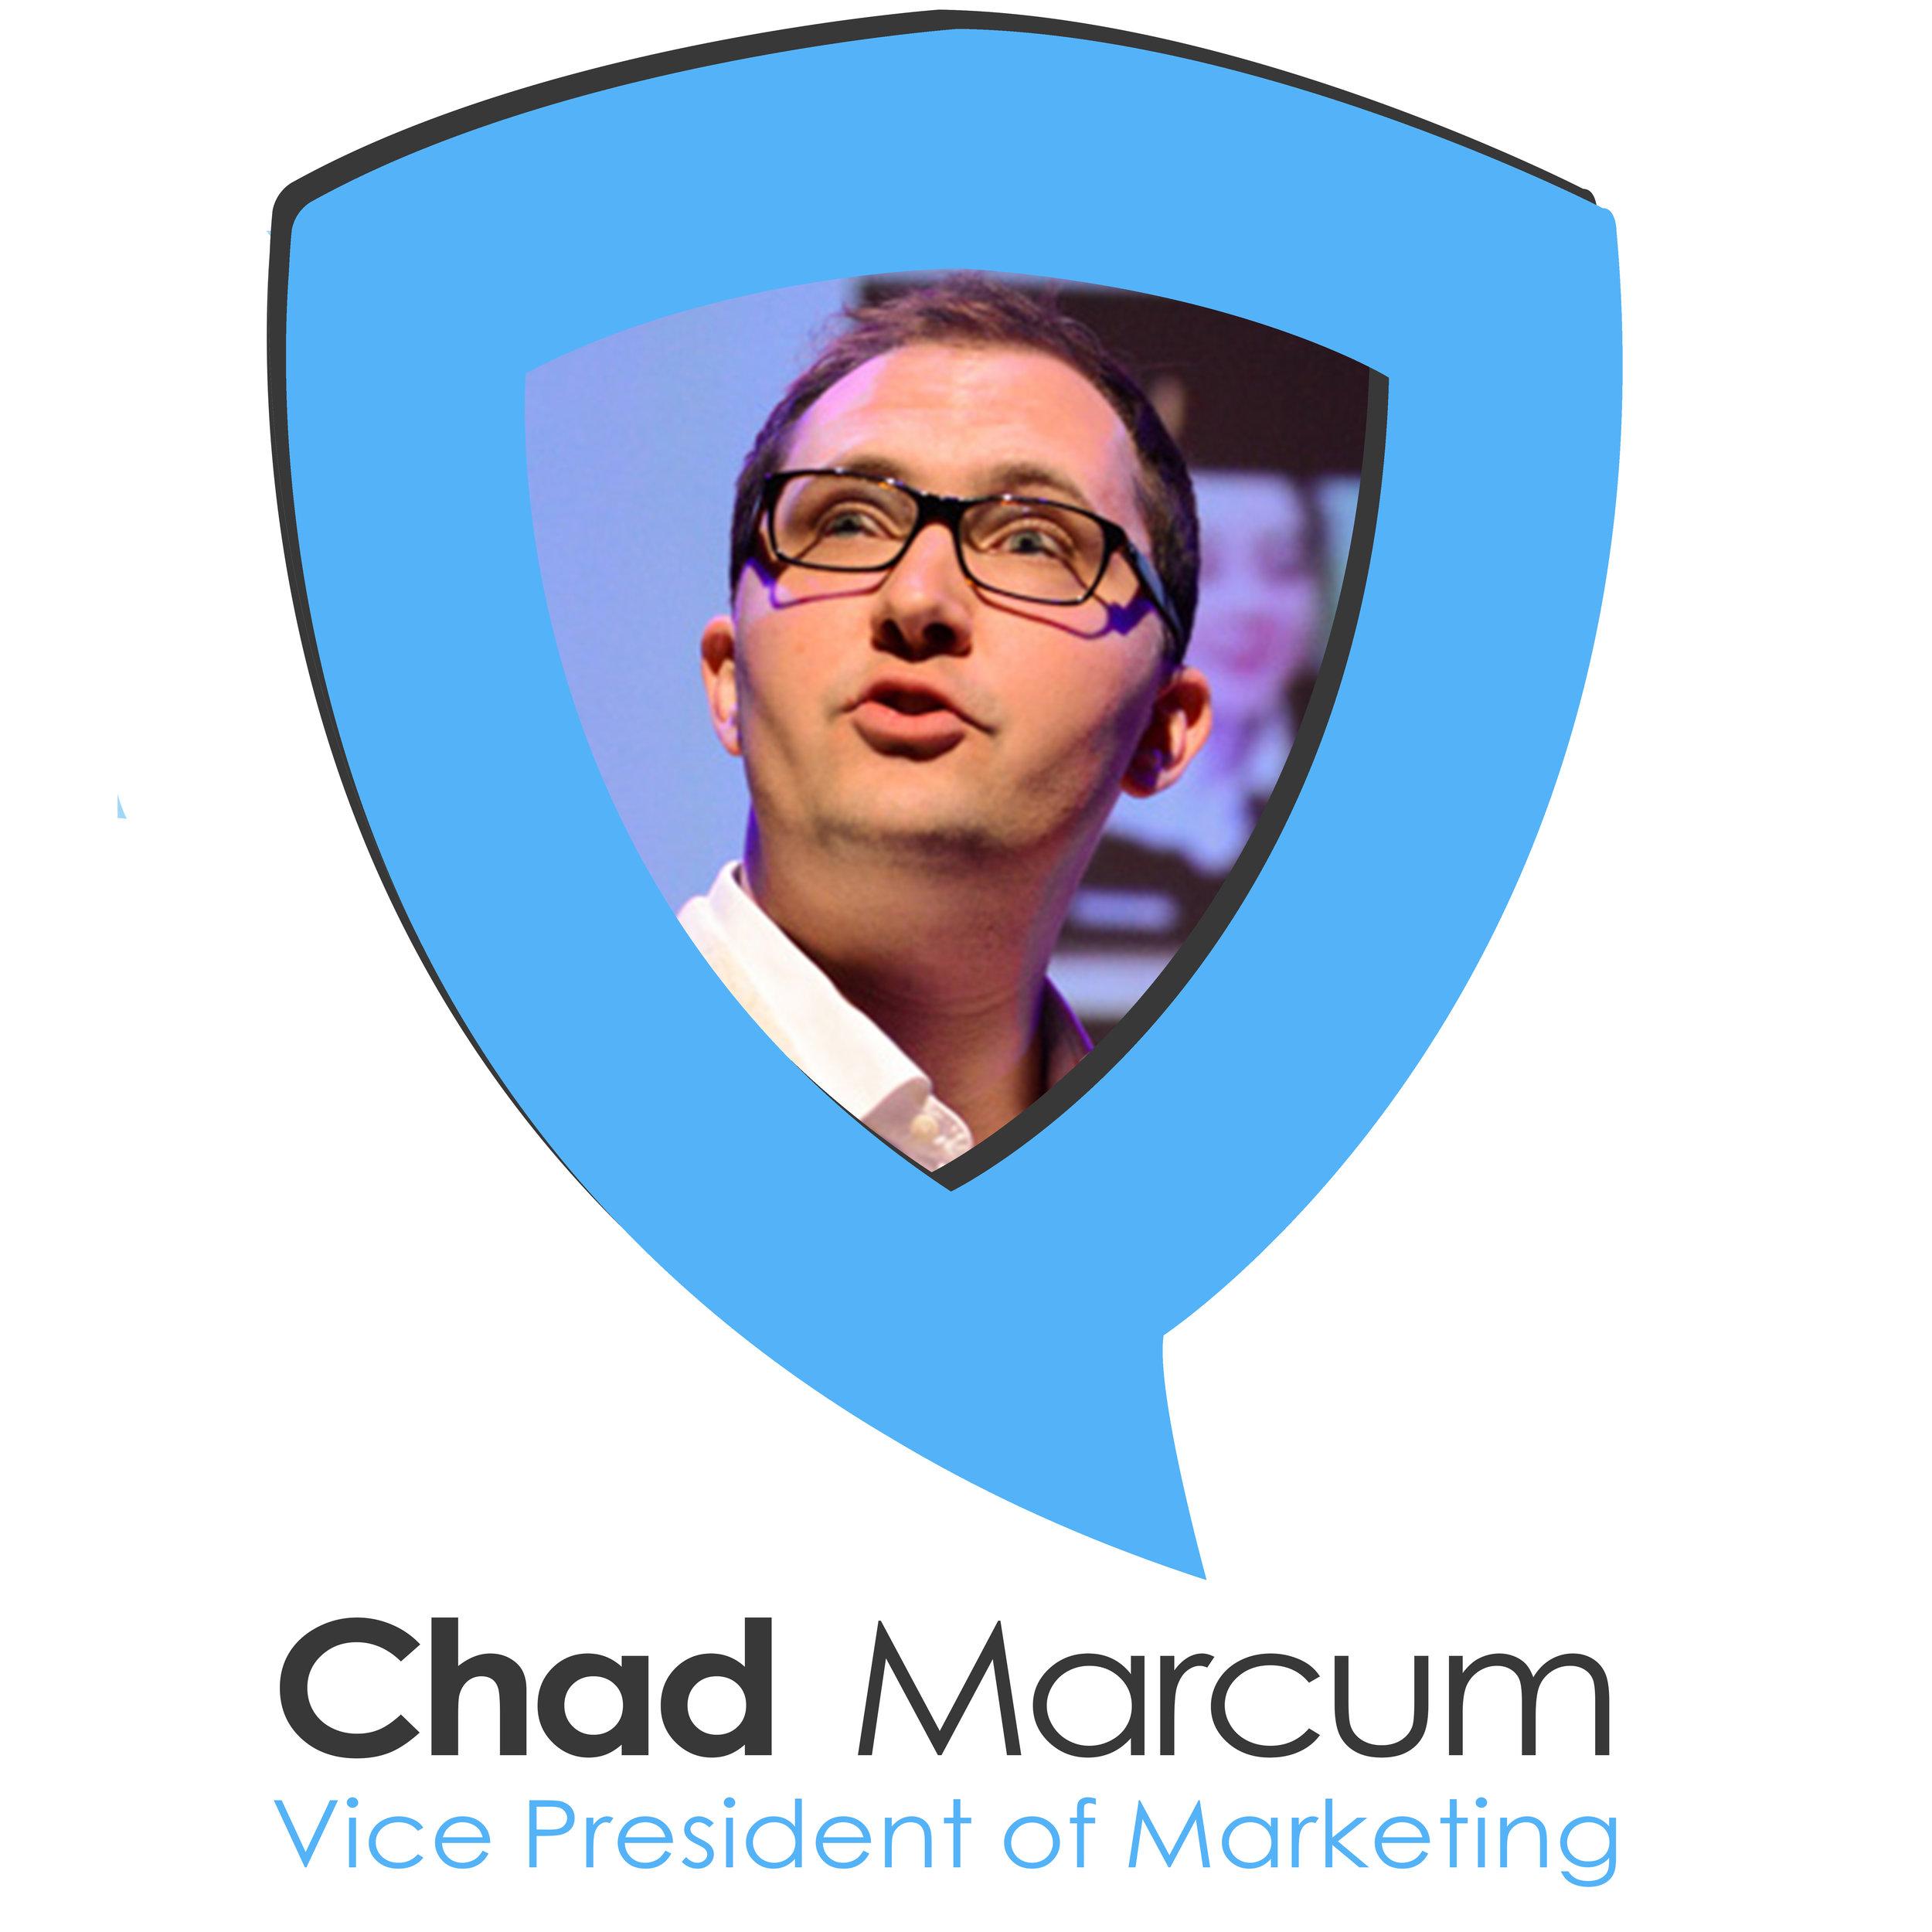 chad2.jpg